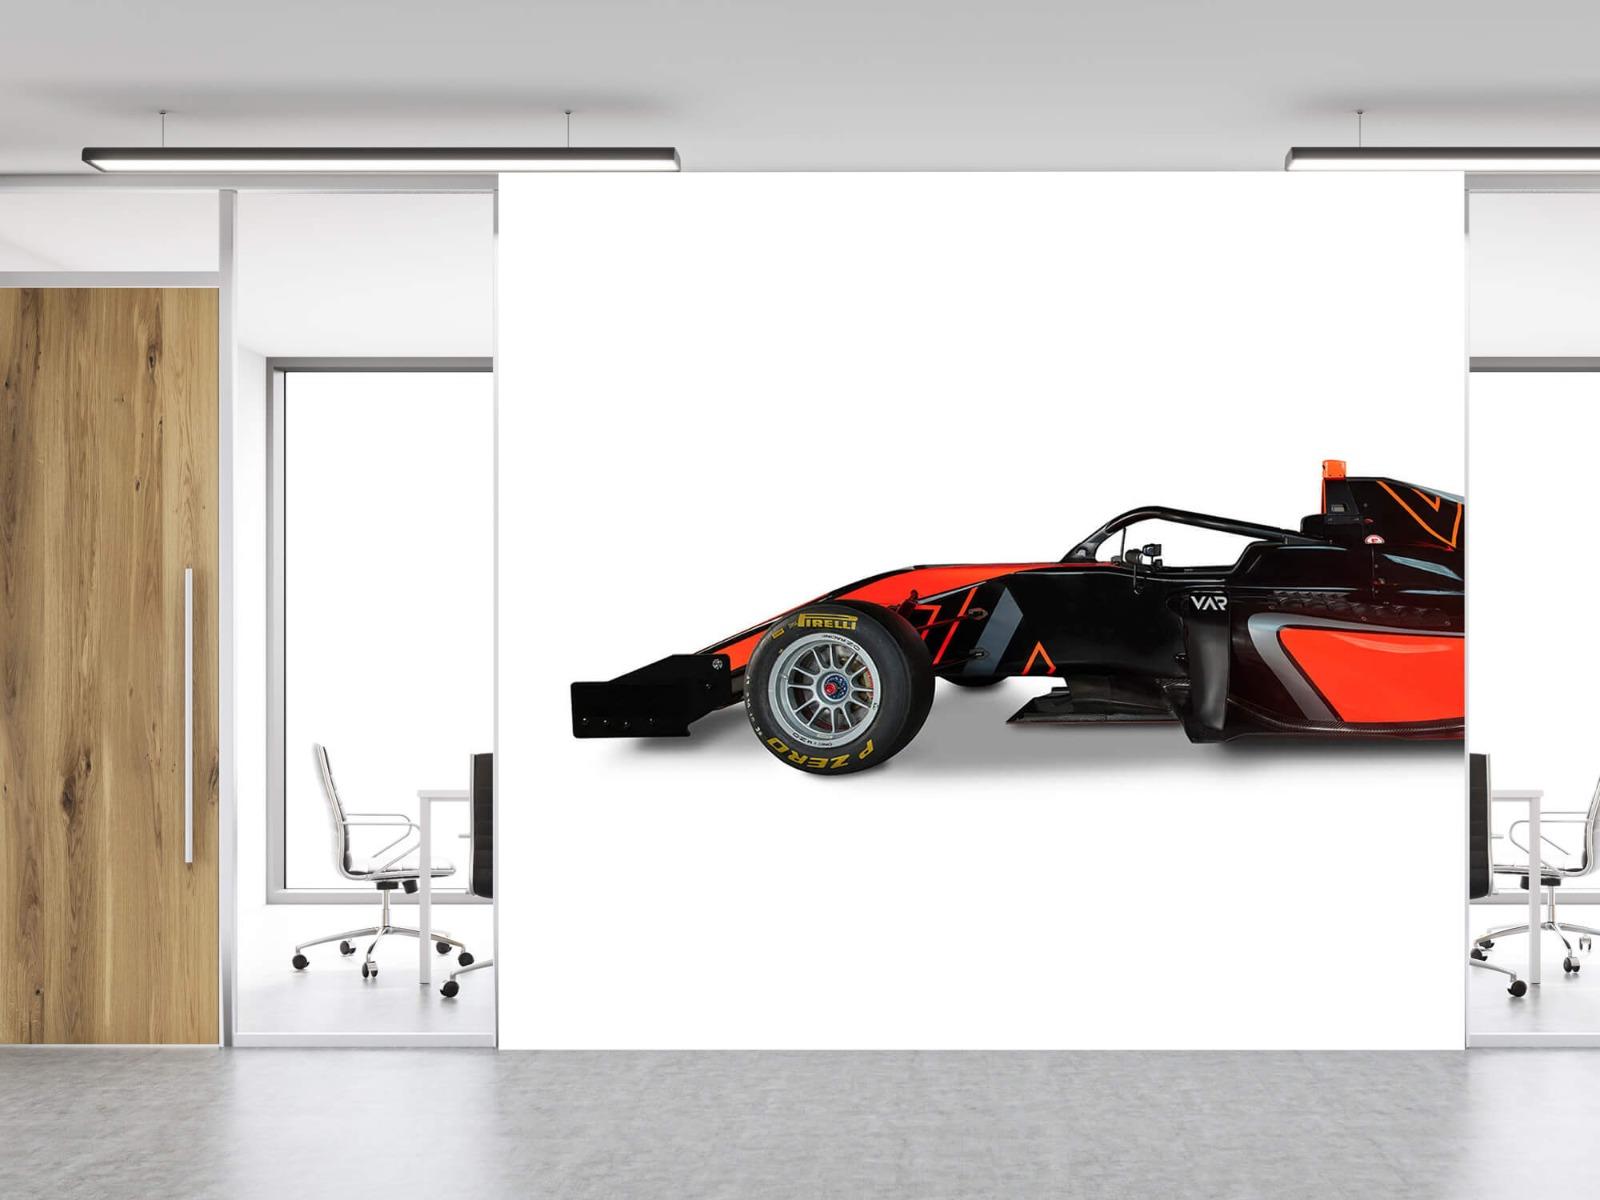 Sportauto's - Formule 3 - Lower side view - Computerruimte 11